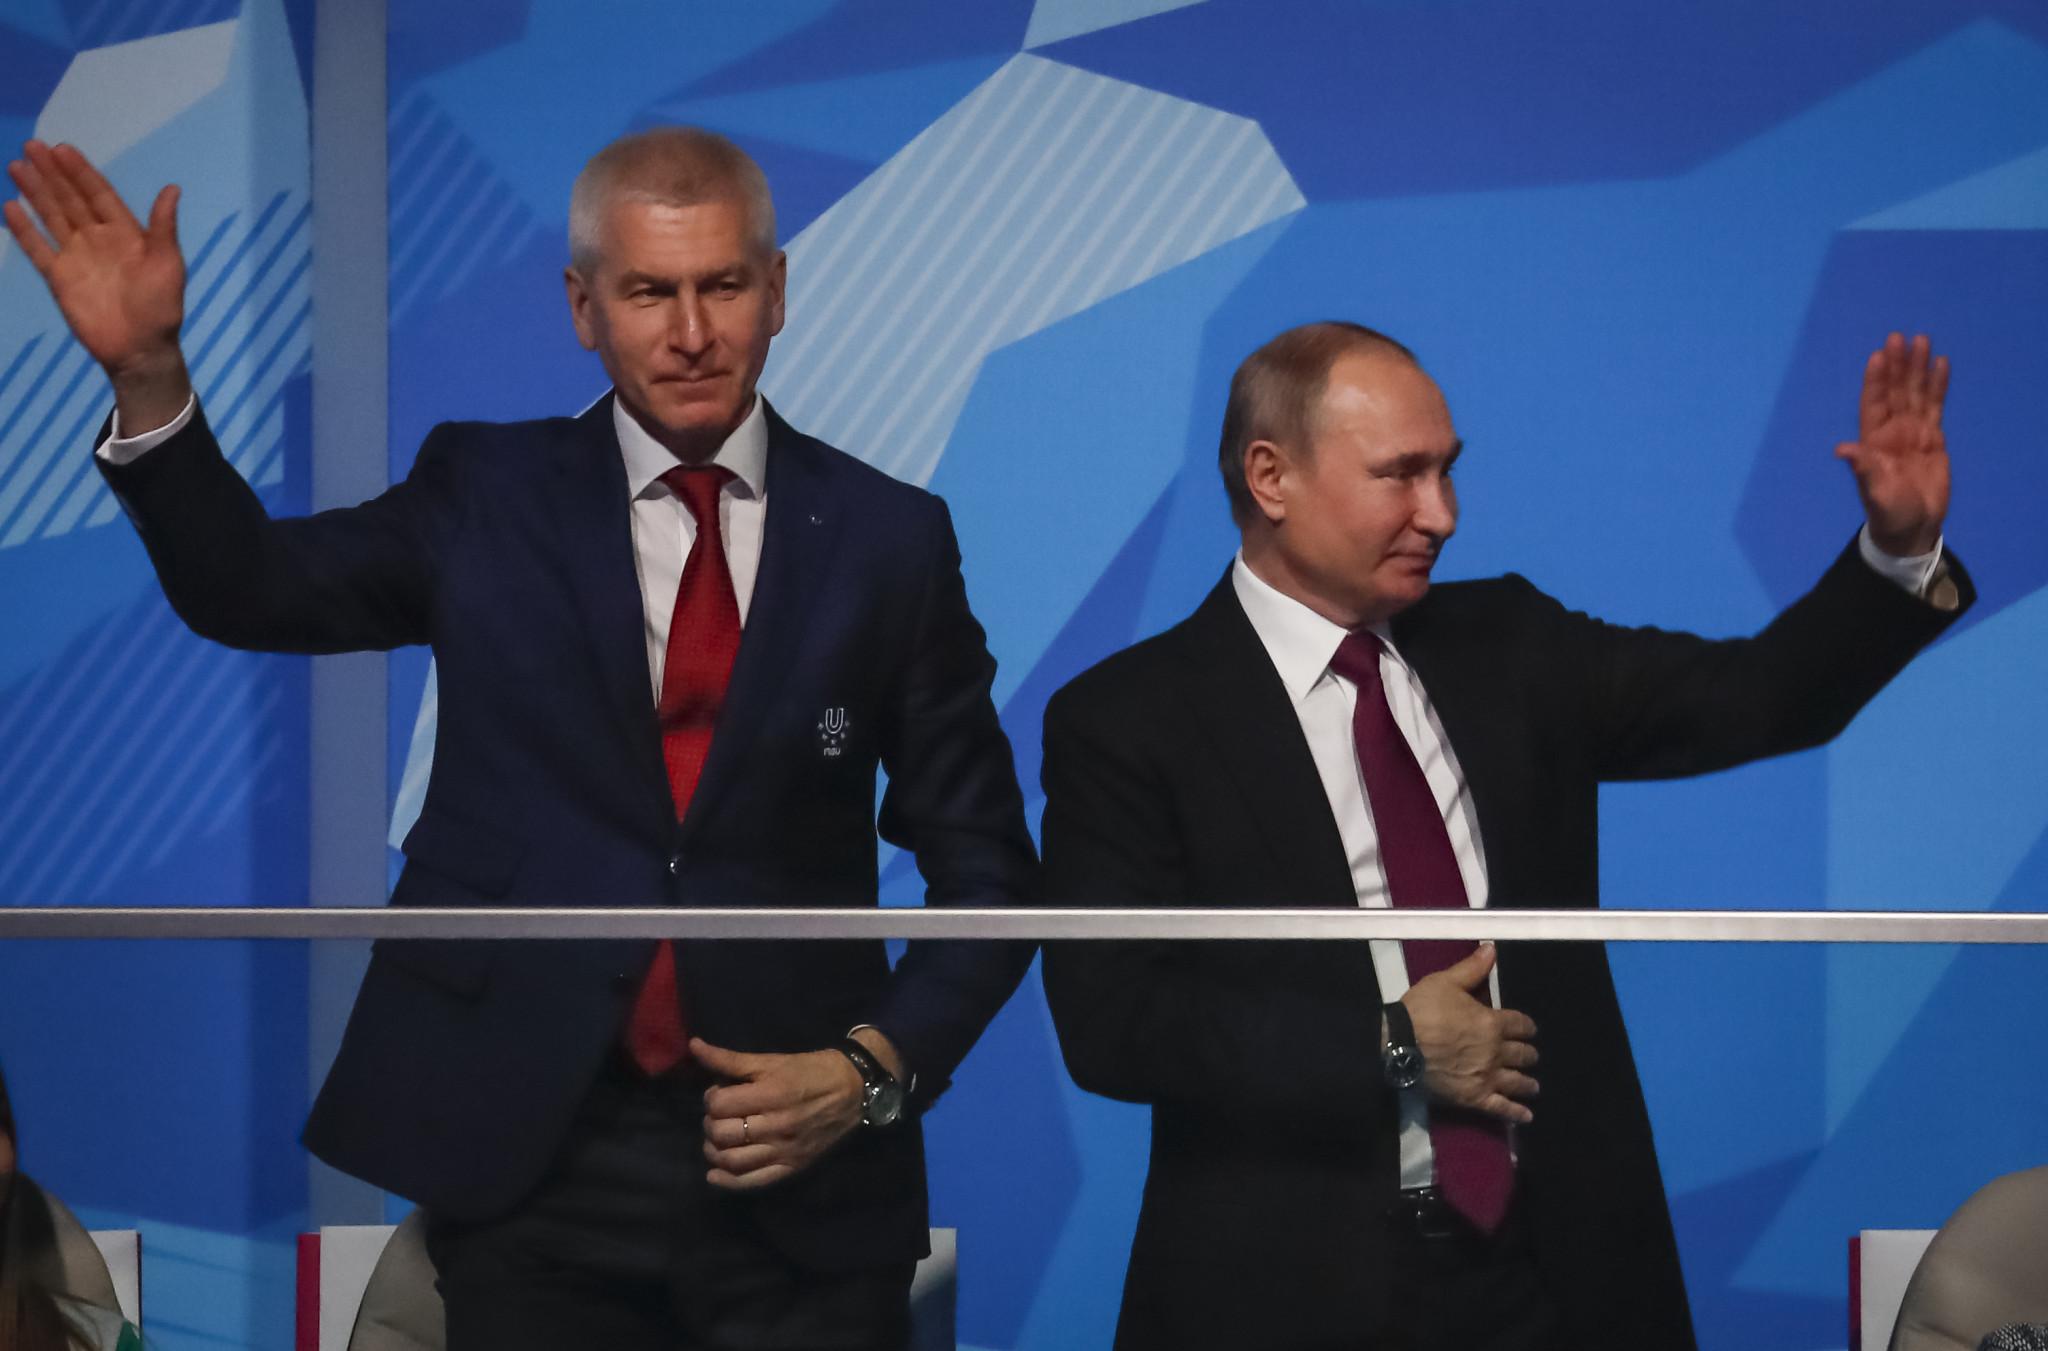 Putin opens Krasnoyarsk 2019 Winter Universiade as Opening Ceremony celebrates Siberia's history and cultural traditions